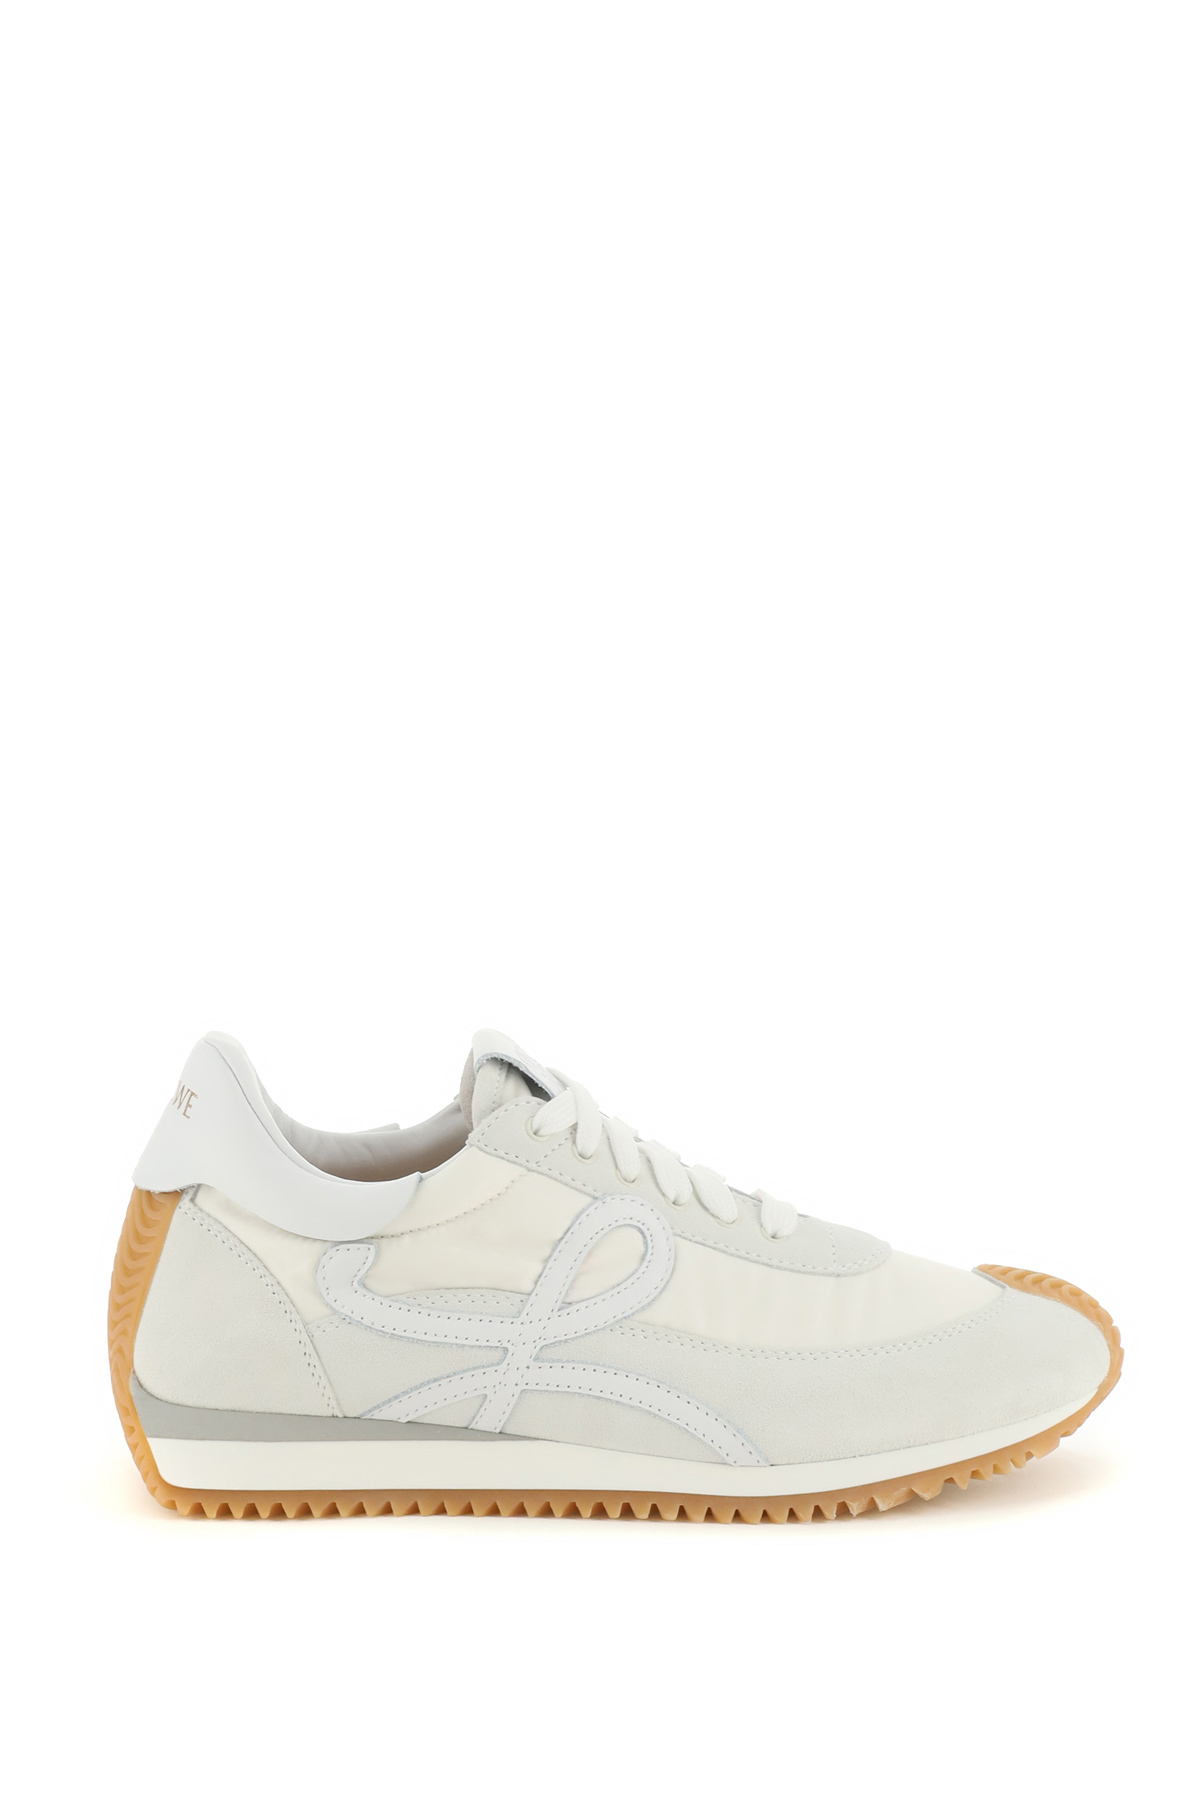 Loewe sneakers flow in pelle e nylon